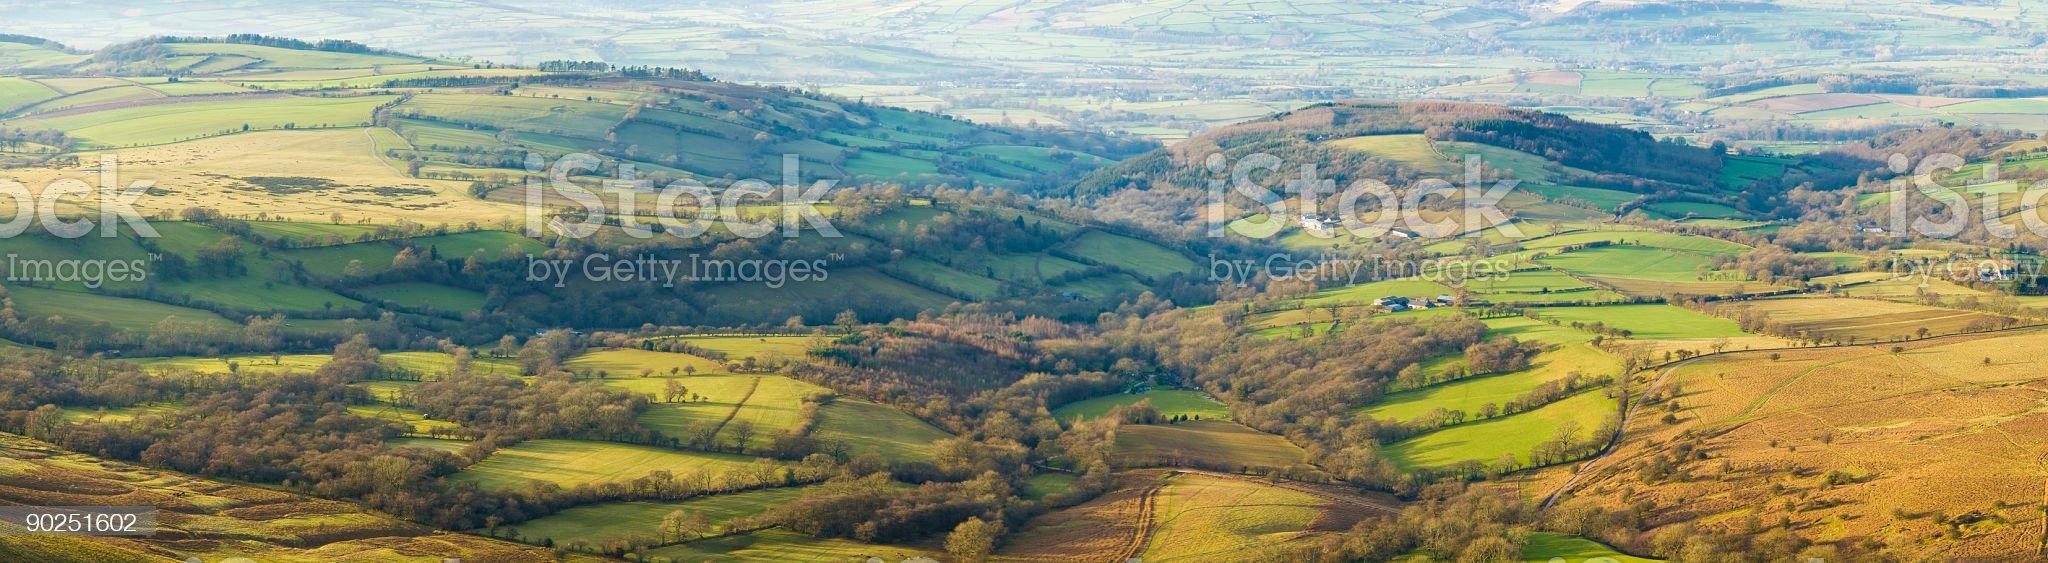 Green pastoral landscape royalty-free stock photo